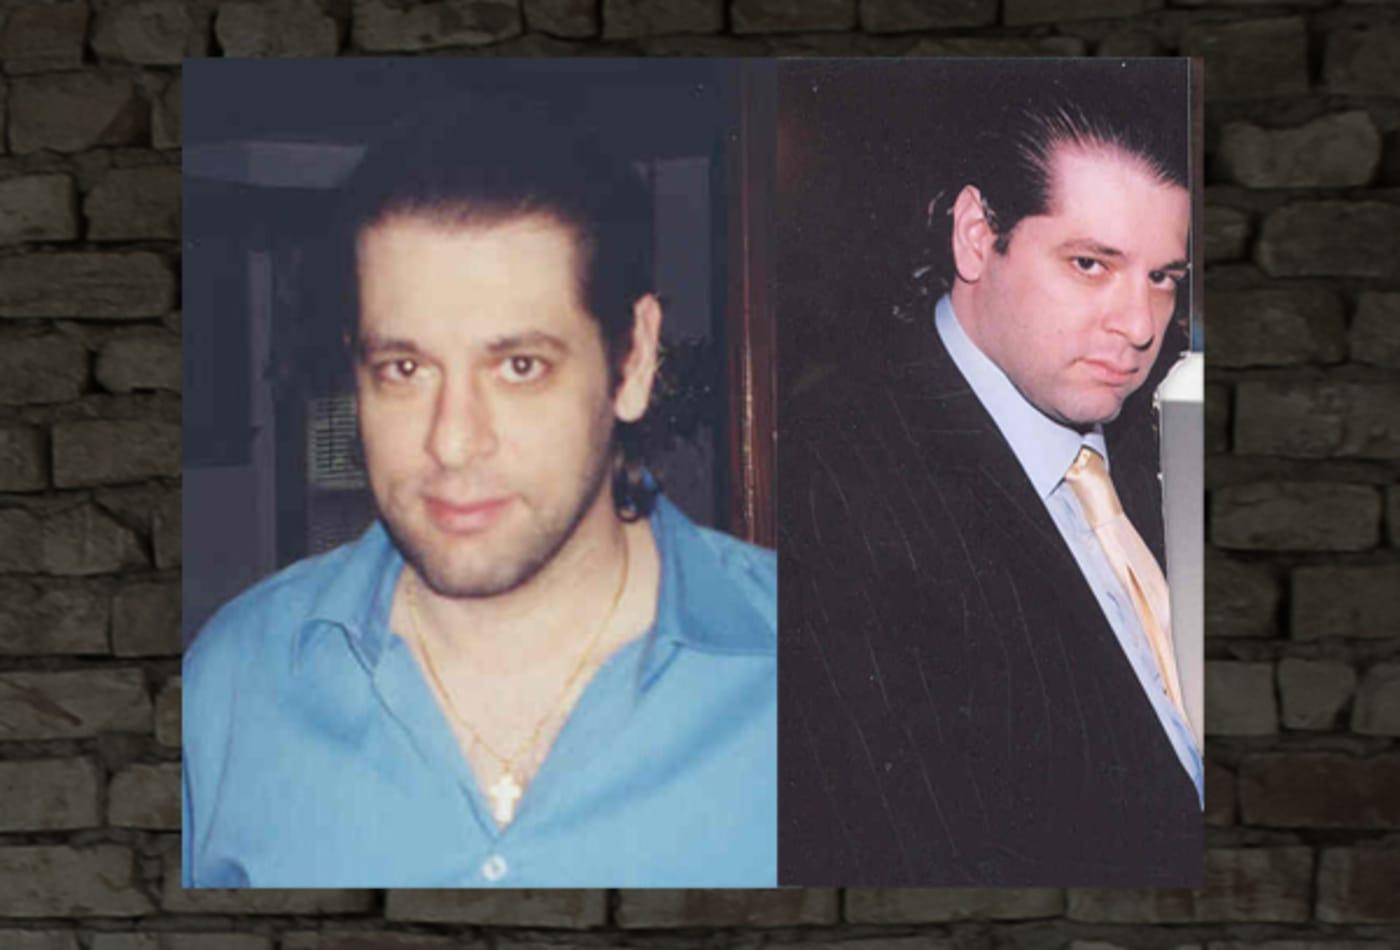 CNBC-white-collar-criminals-Germenis.jpg